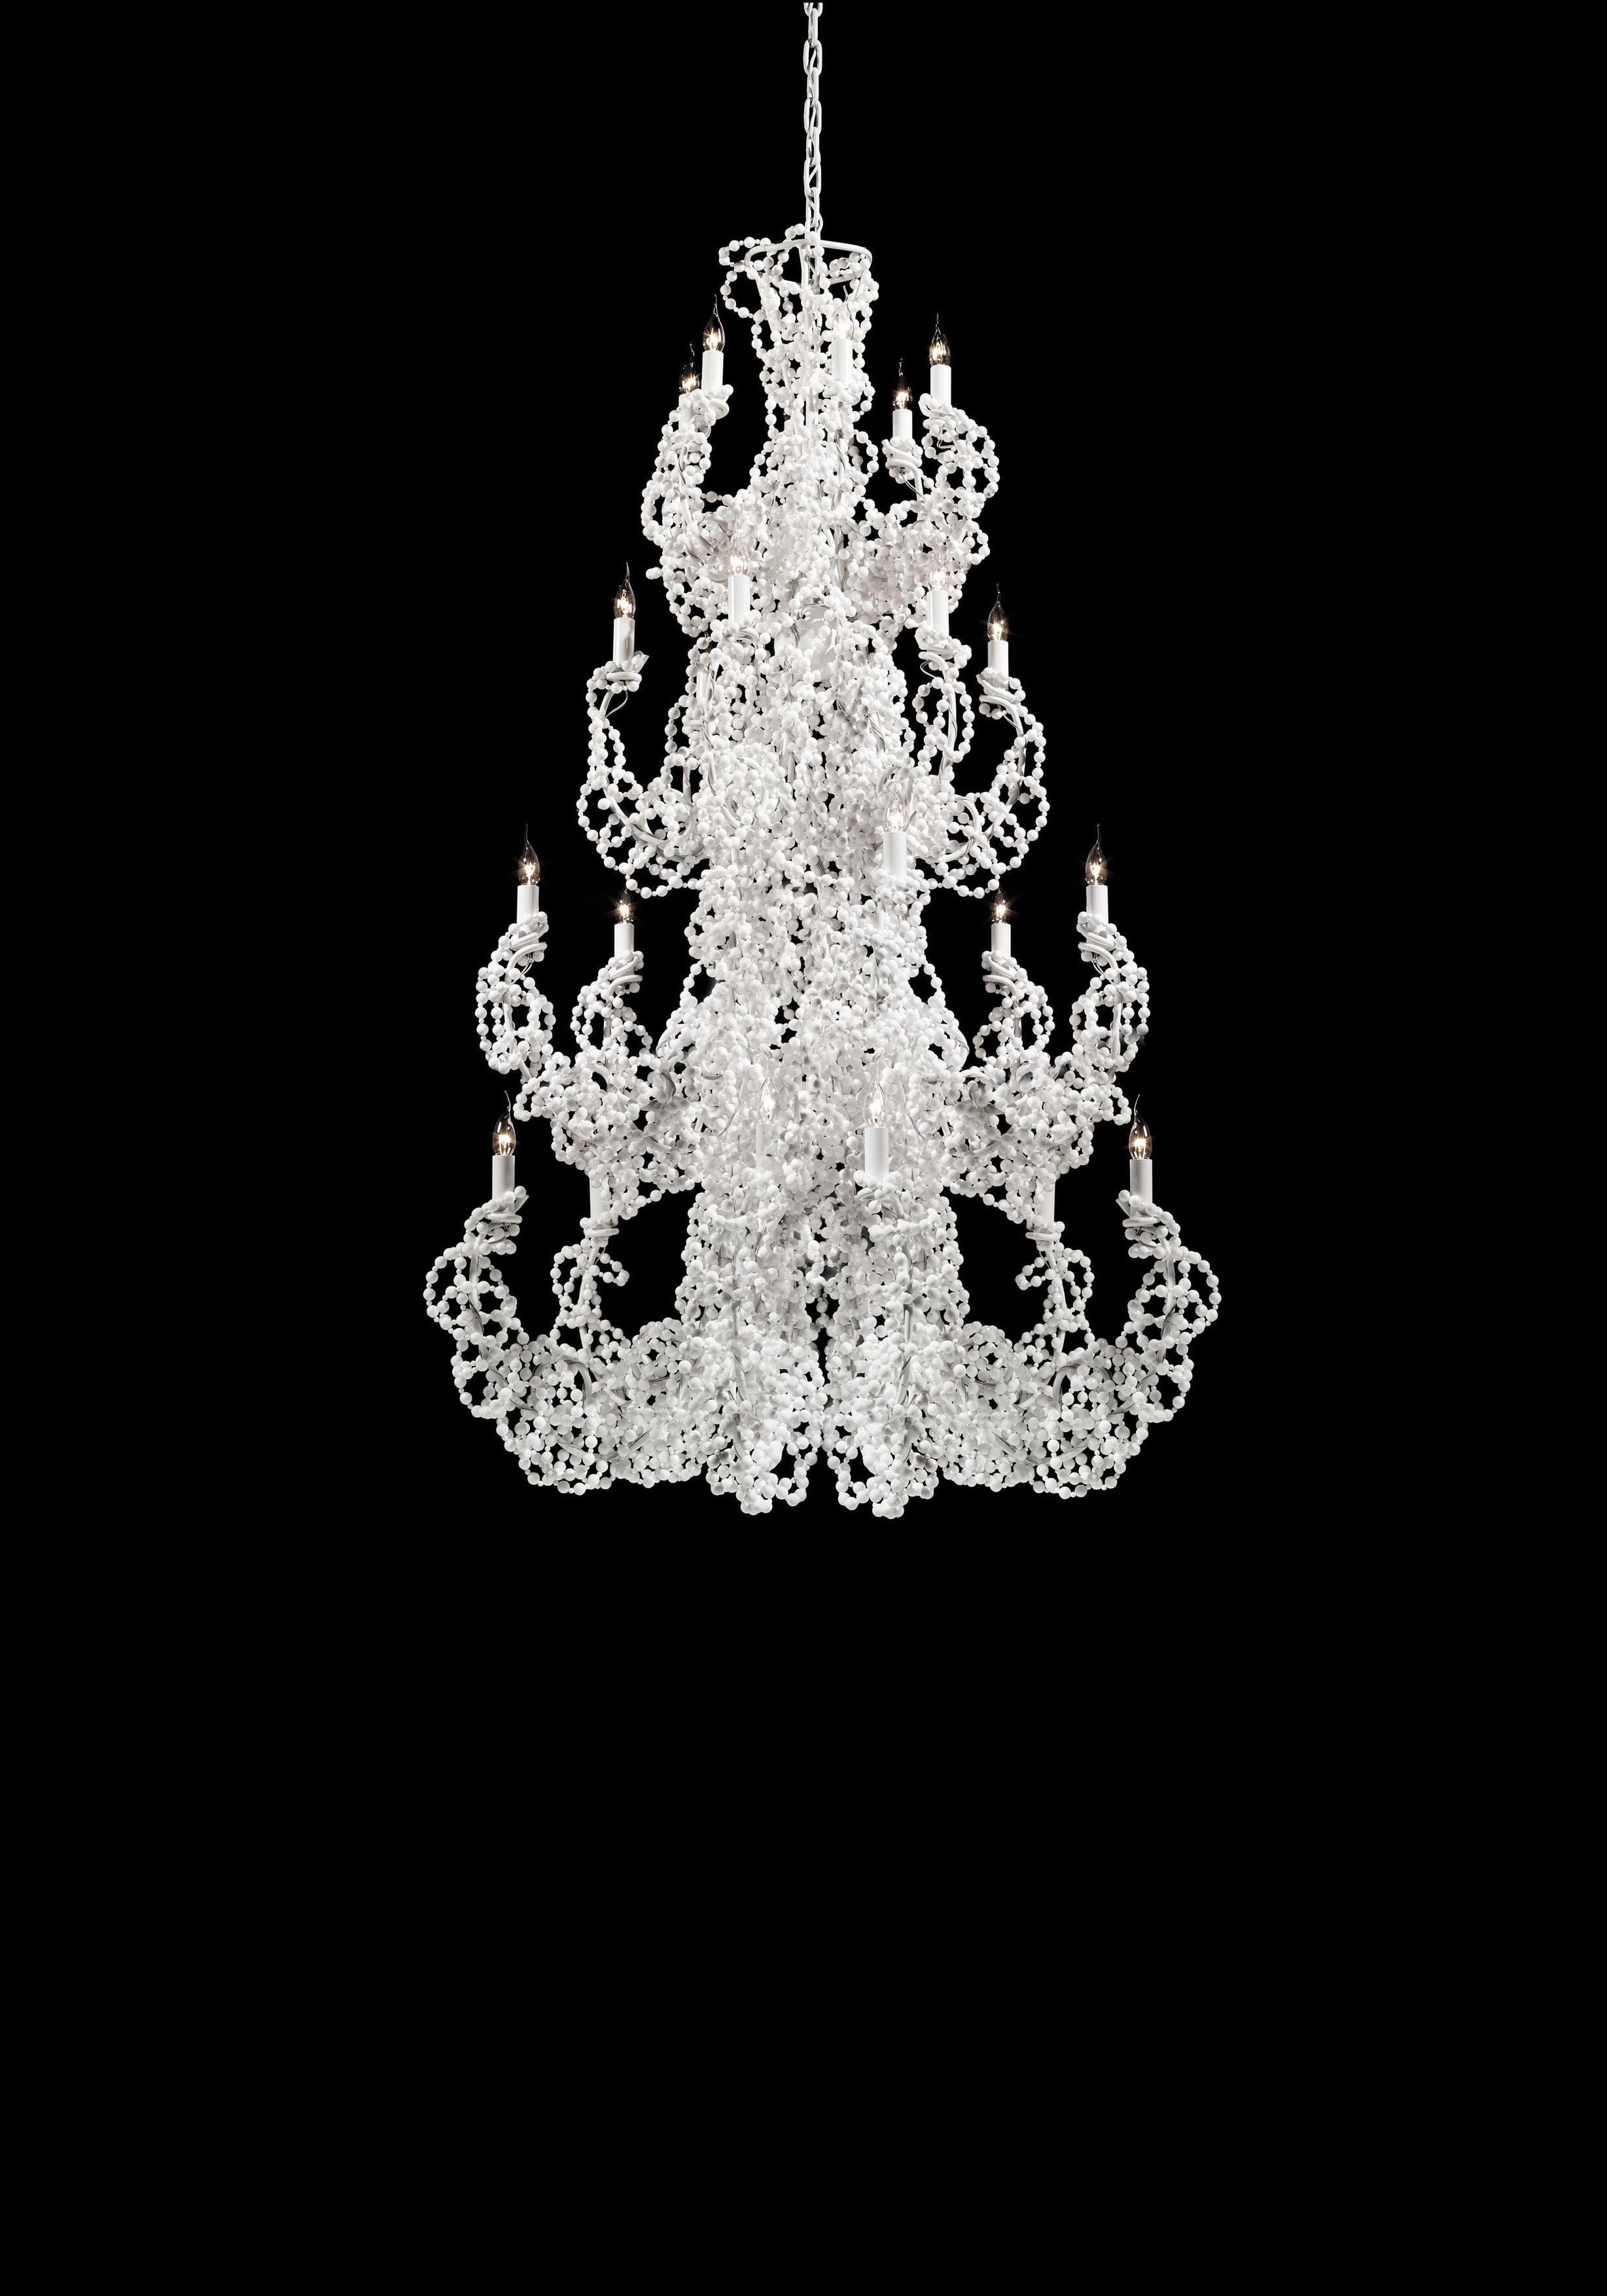 Coco chandelier by brand van egmond stylepark coco chandelier arubaitofo Gallery